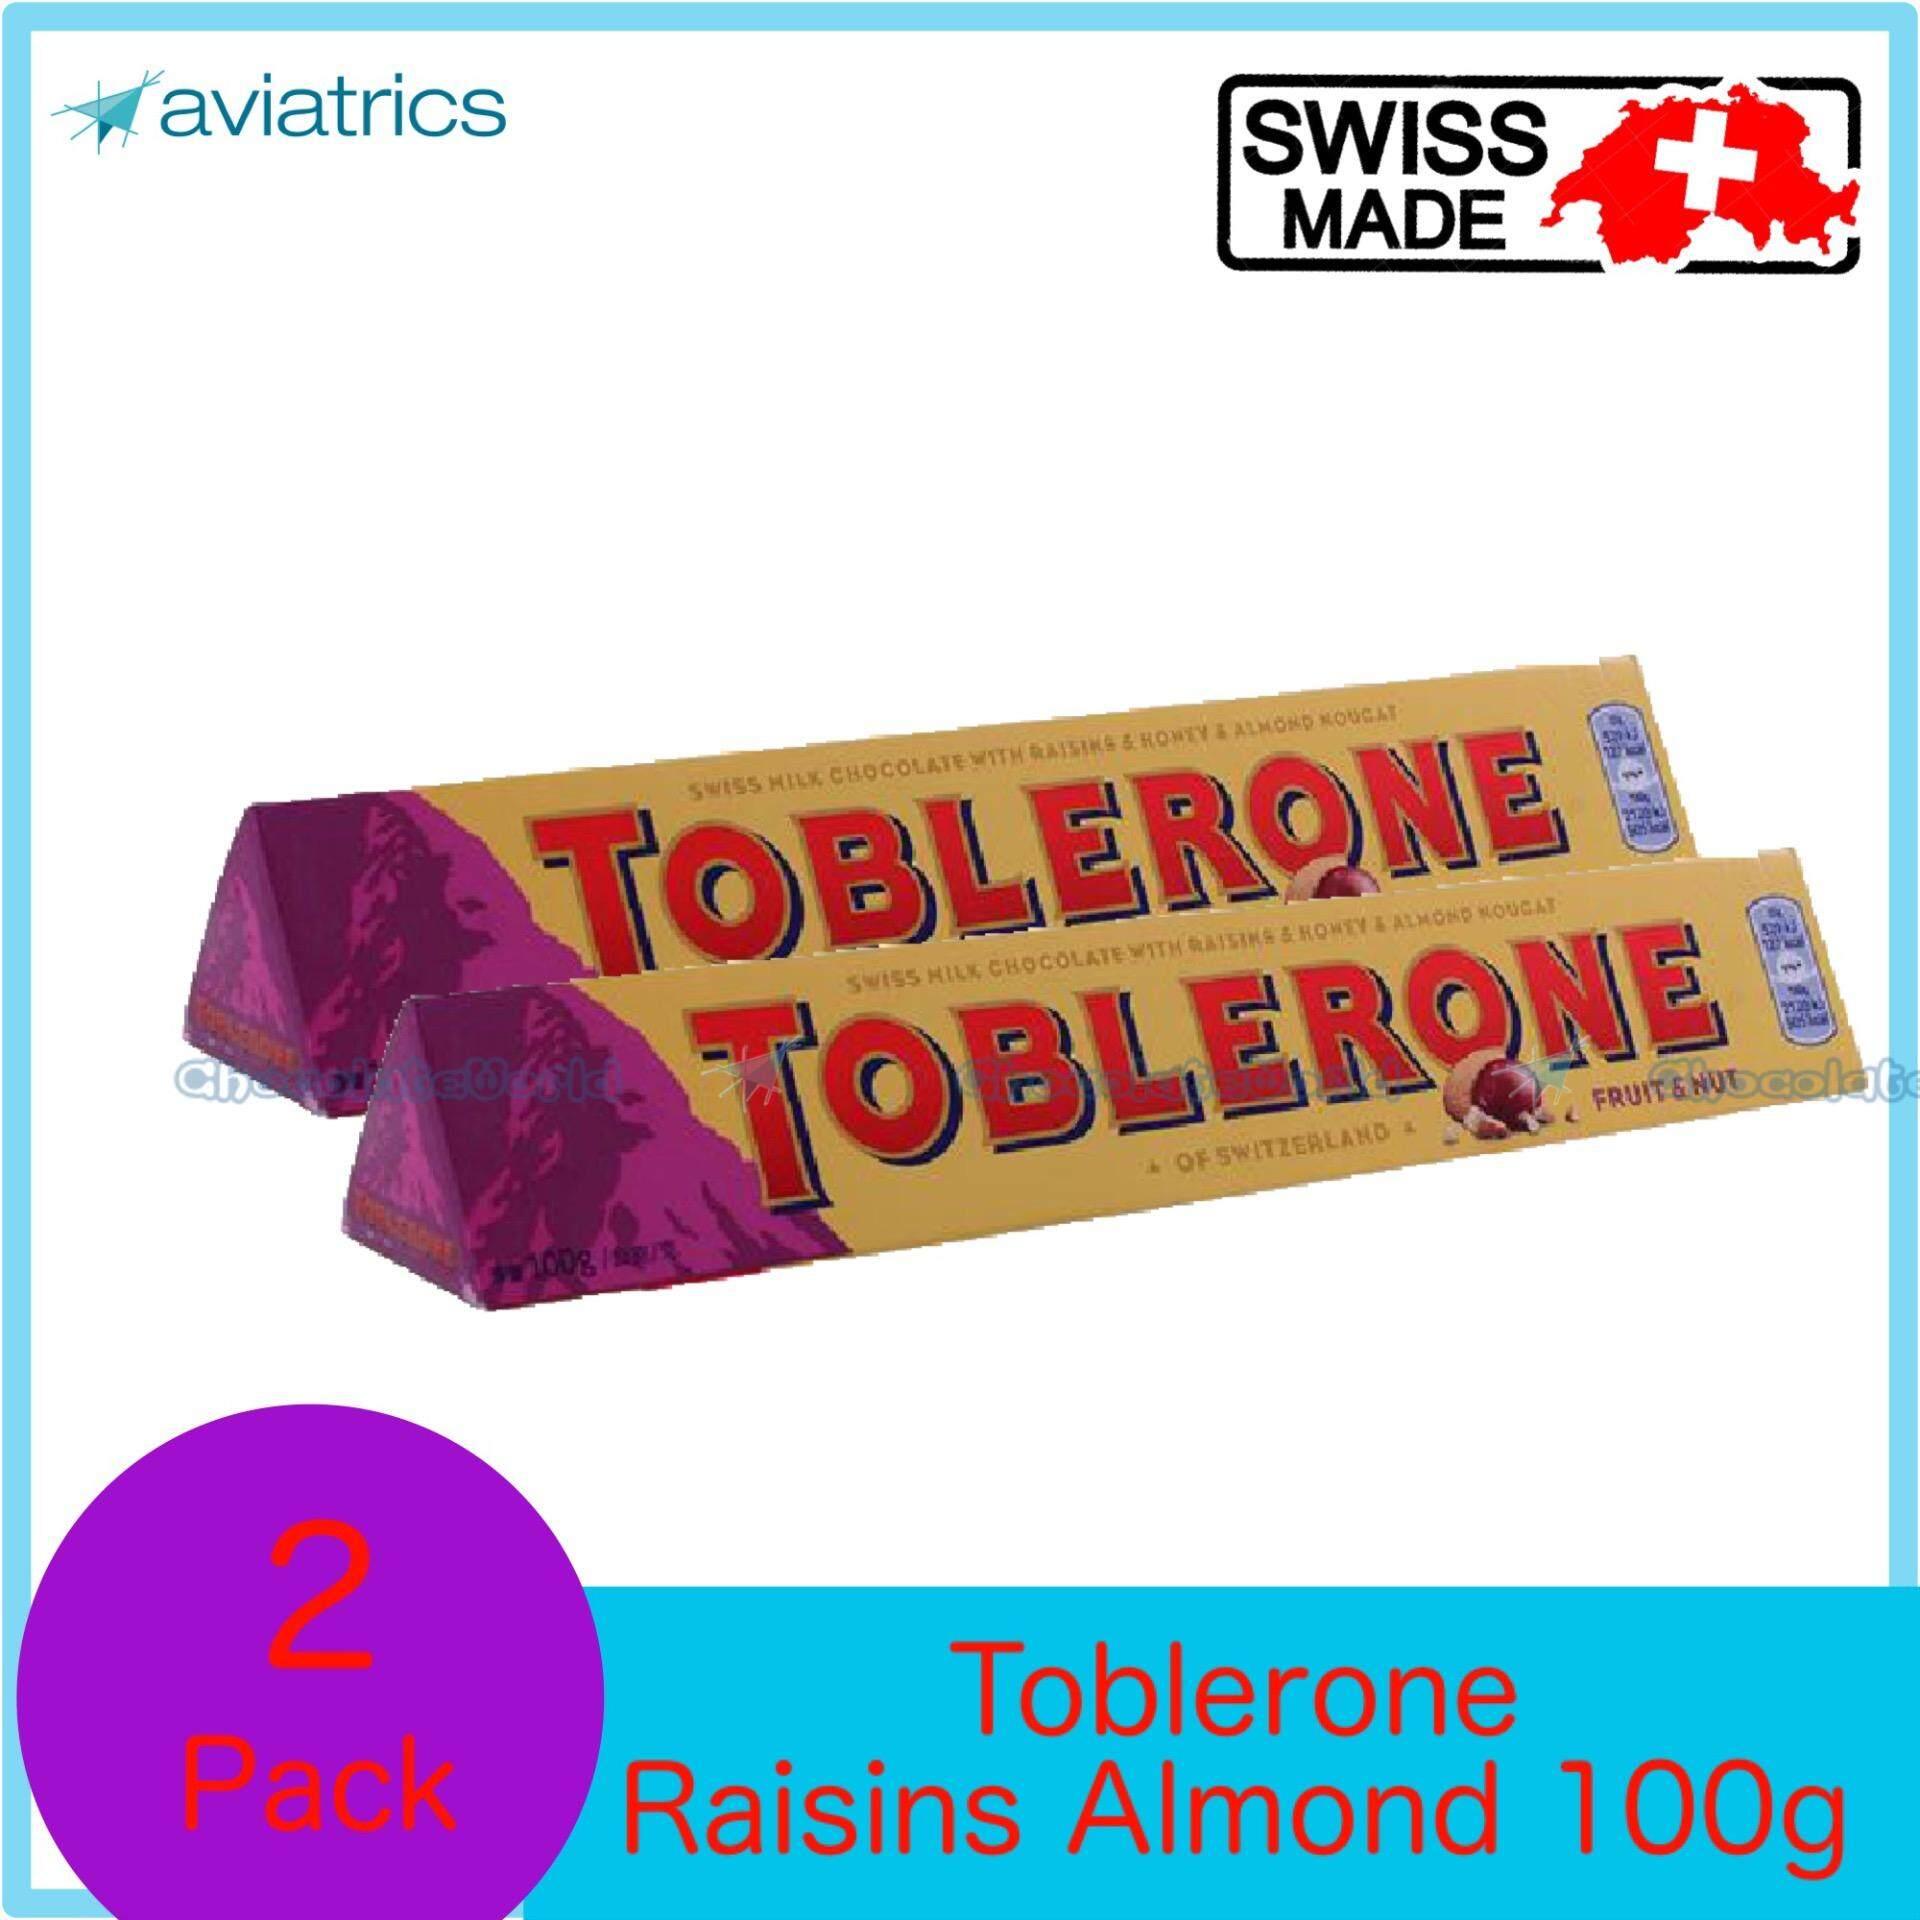 Toblerone Chocolate with Raisin 100g X 2 (SWISS MADE)